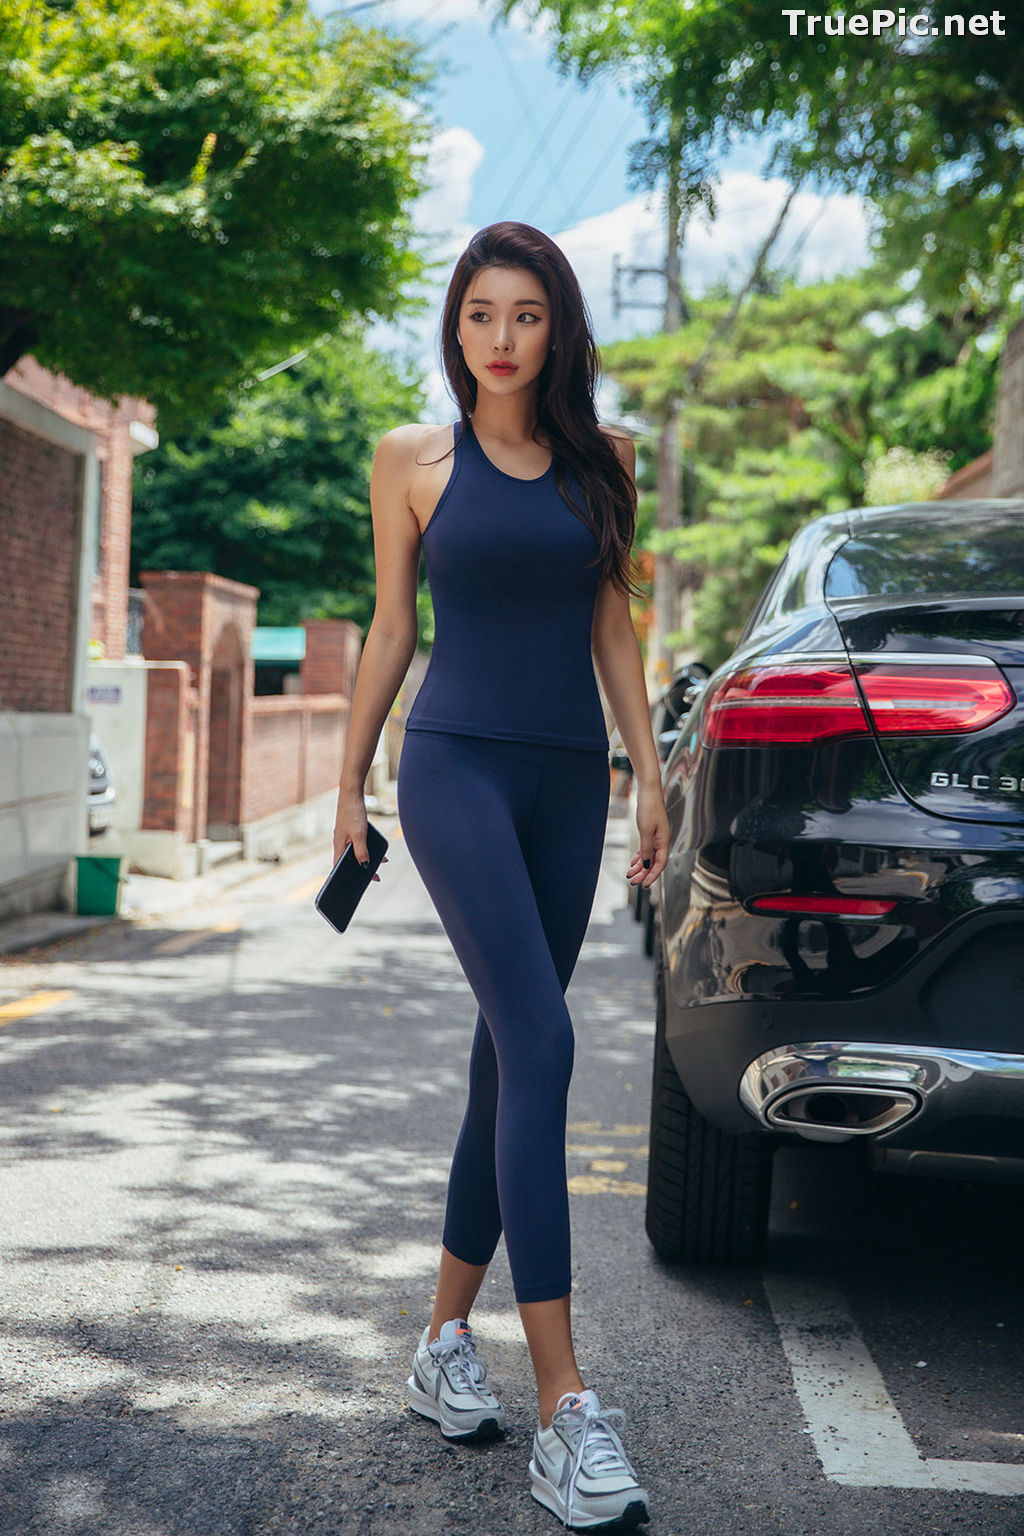 Image Korean Fashion Model - Park Da Hyun - Navy Sportswear - TruePic.net - Picture-10